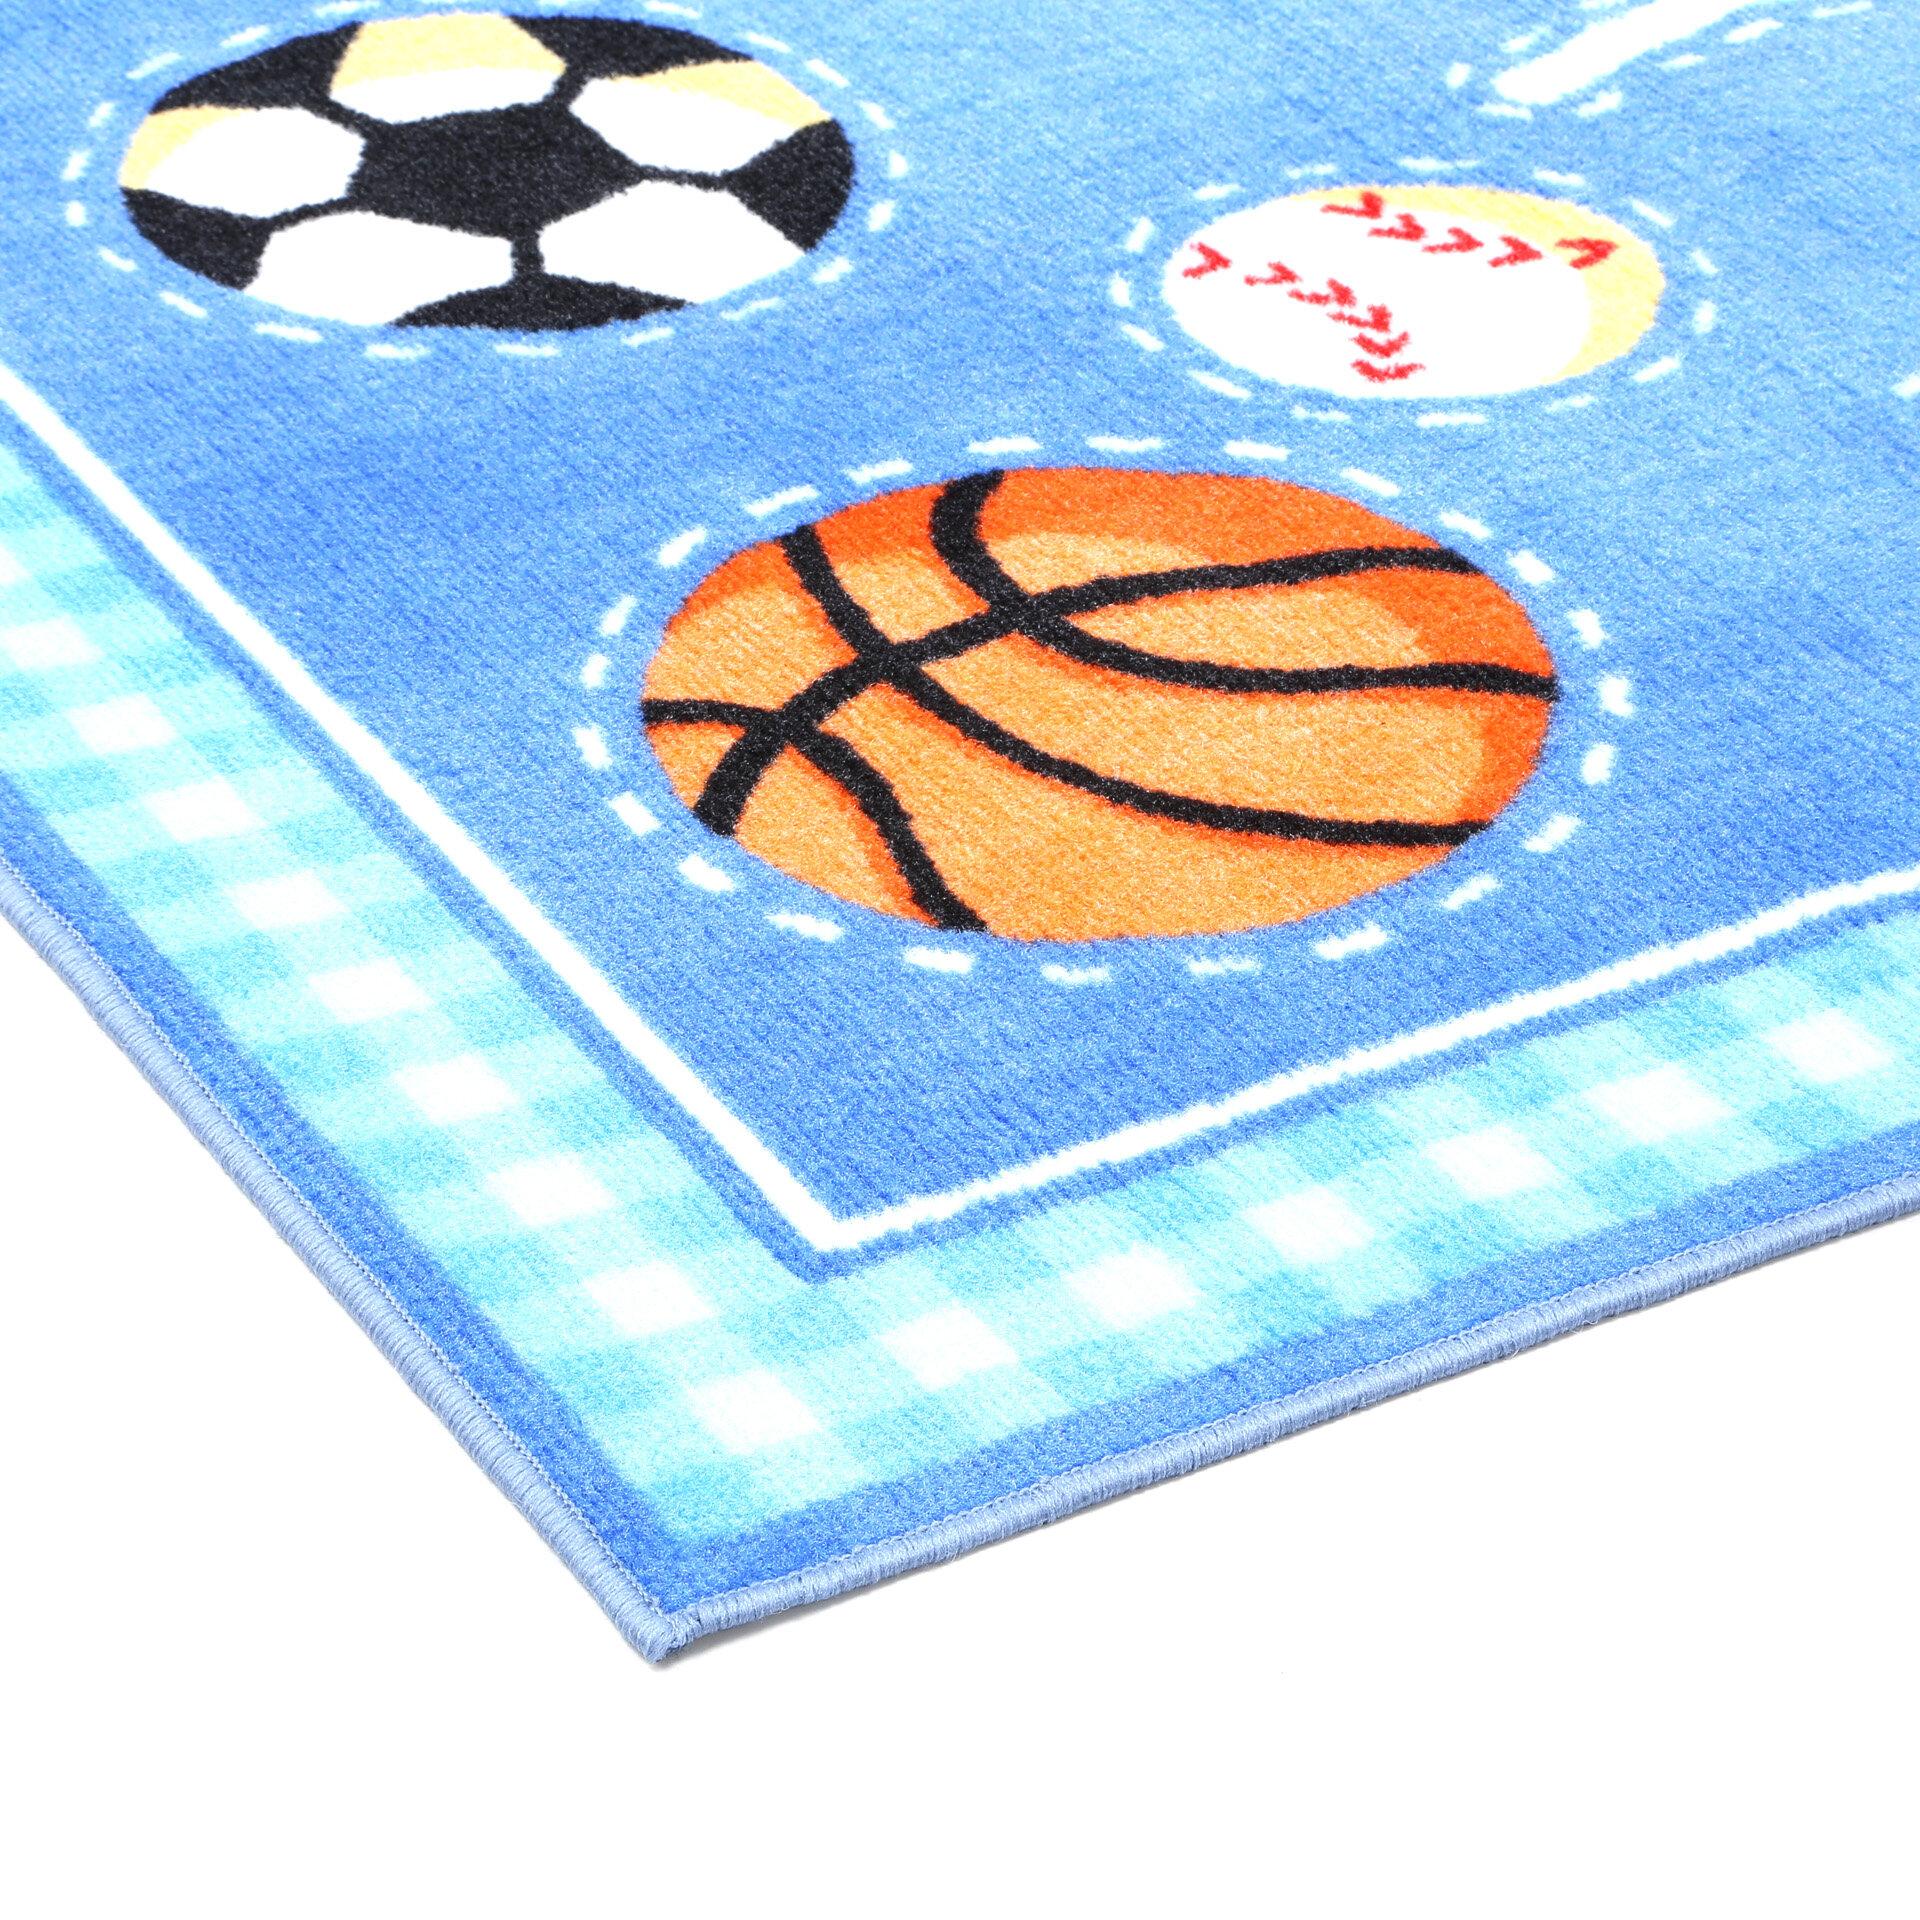 Fun Rugs Olive Kids Go Team Sports Blue Area Rug